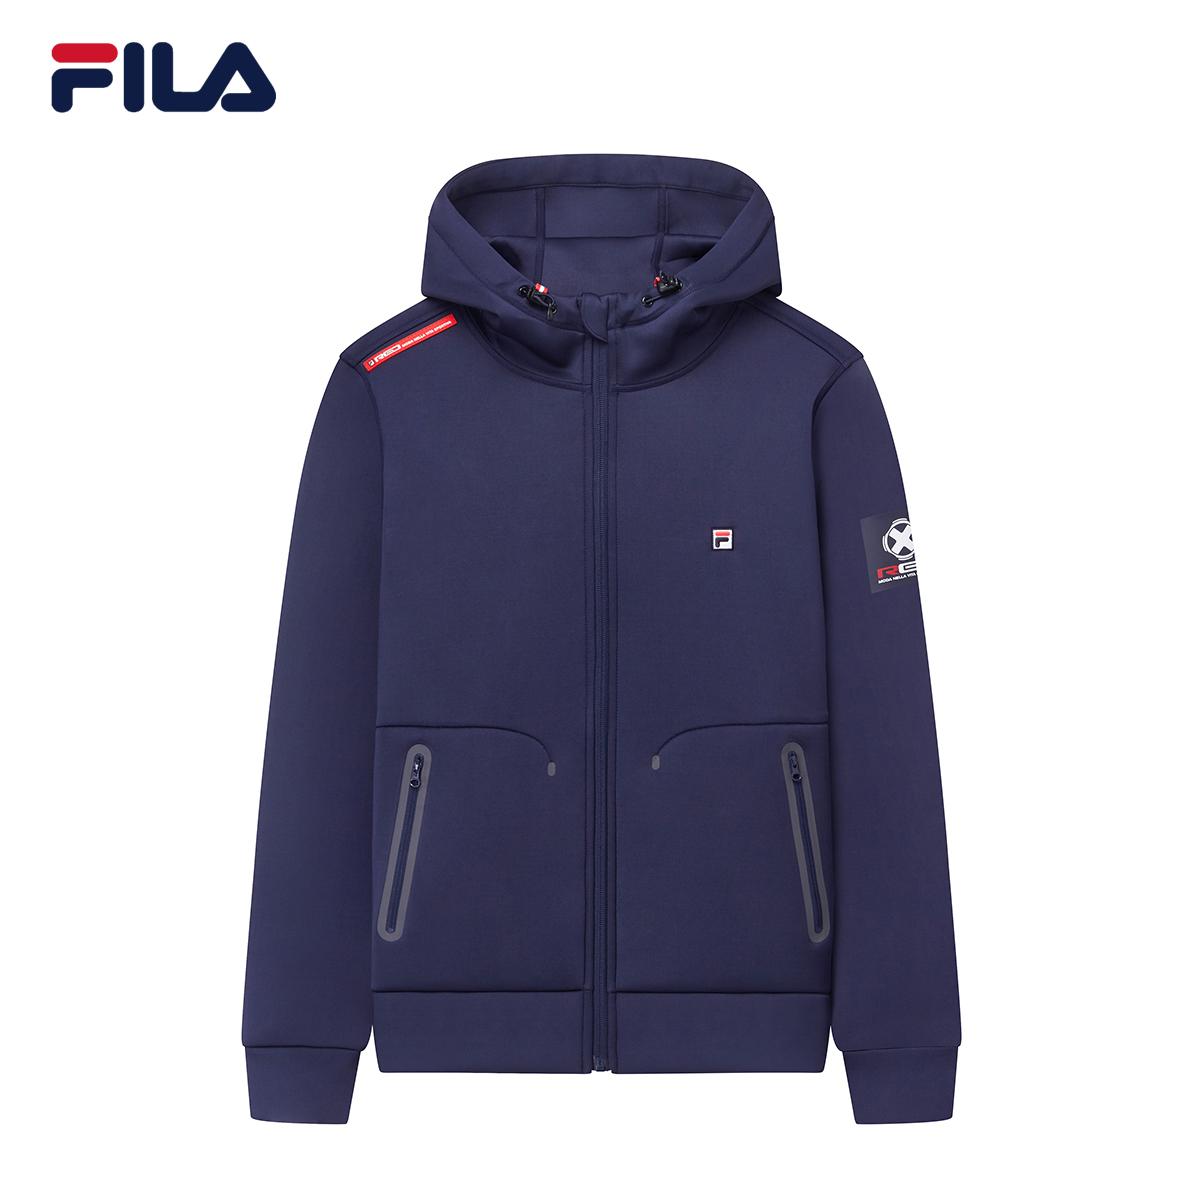 FILA斐乐男外套2018秋季新款运动上衣简约时尚长袖连帽运动外套男